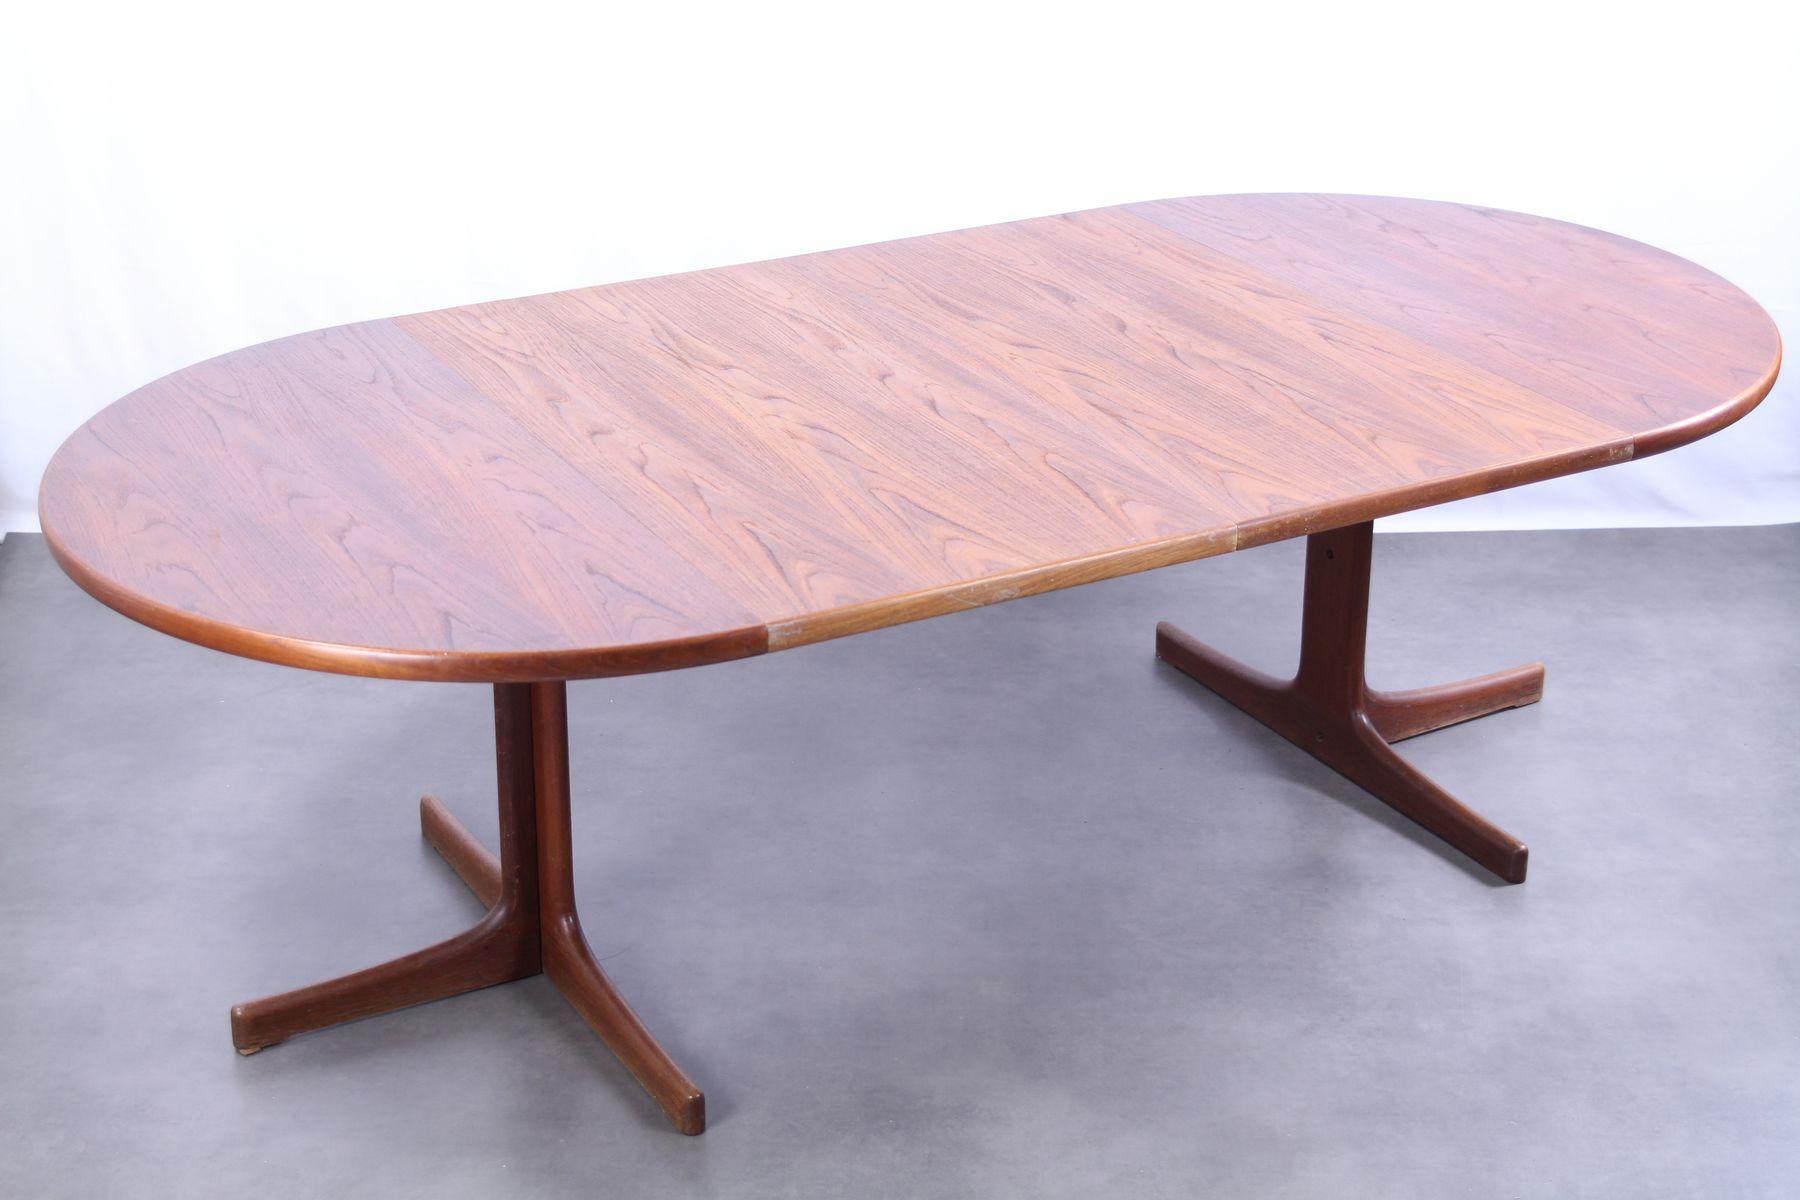 Vintage Oak Dining Table Vintage Round Dining Table Free Image